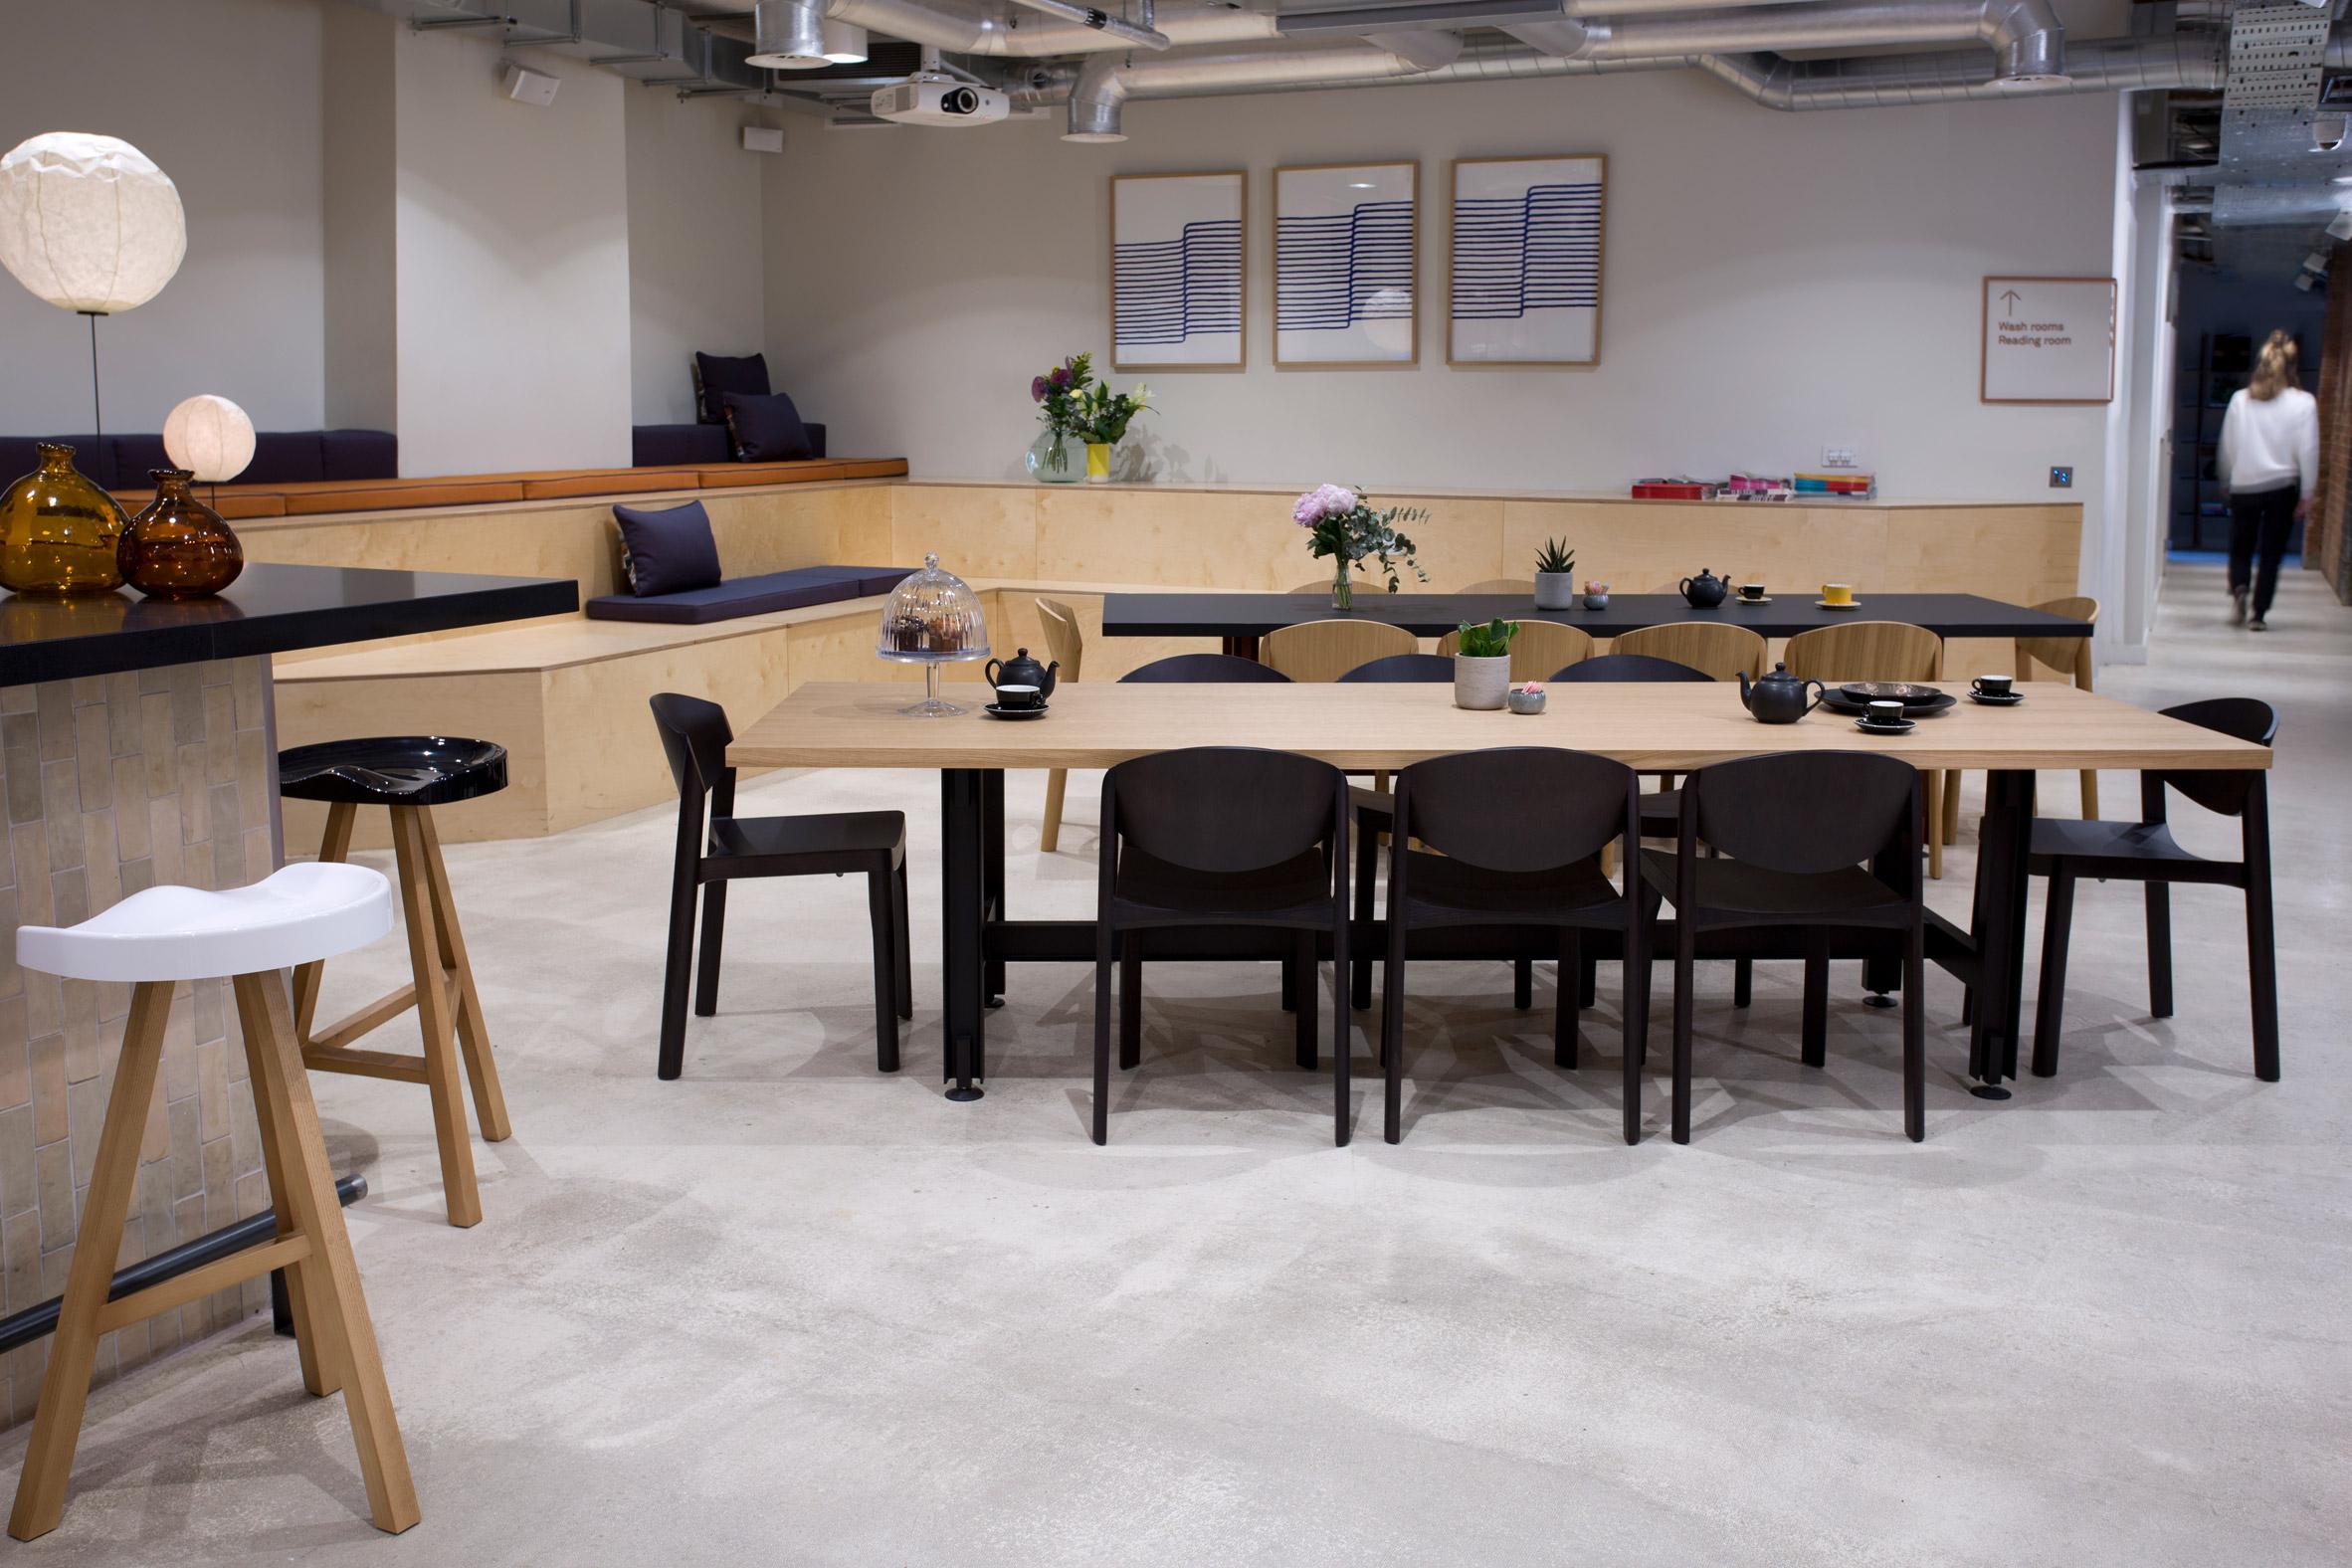 established-sons-at-work-office-furniture-fora_dezeen_2364_col_9.jpg